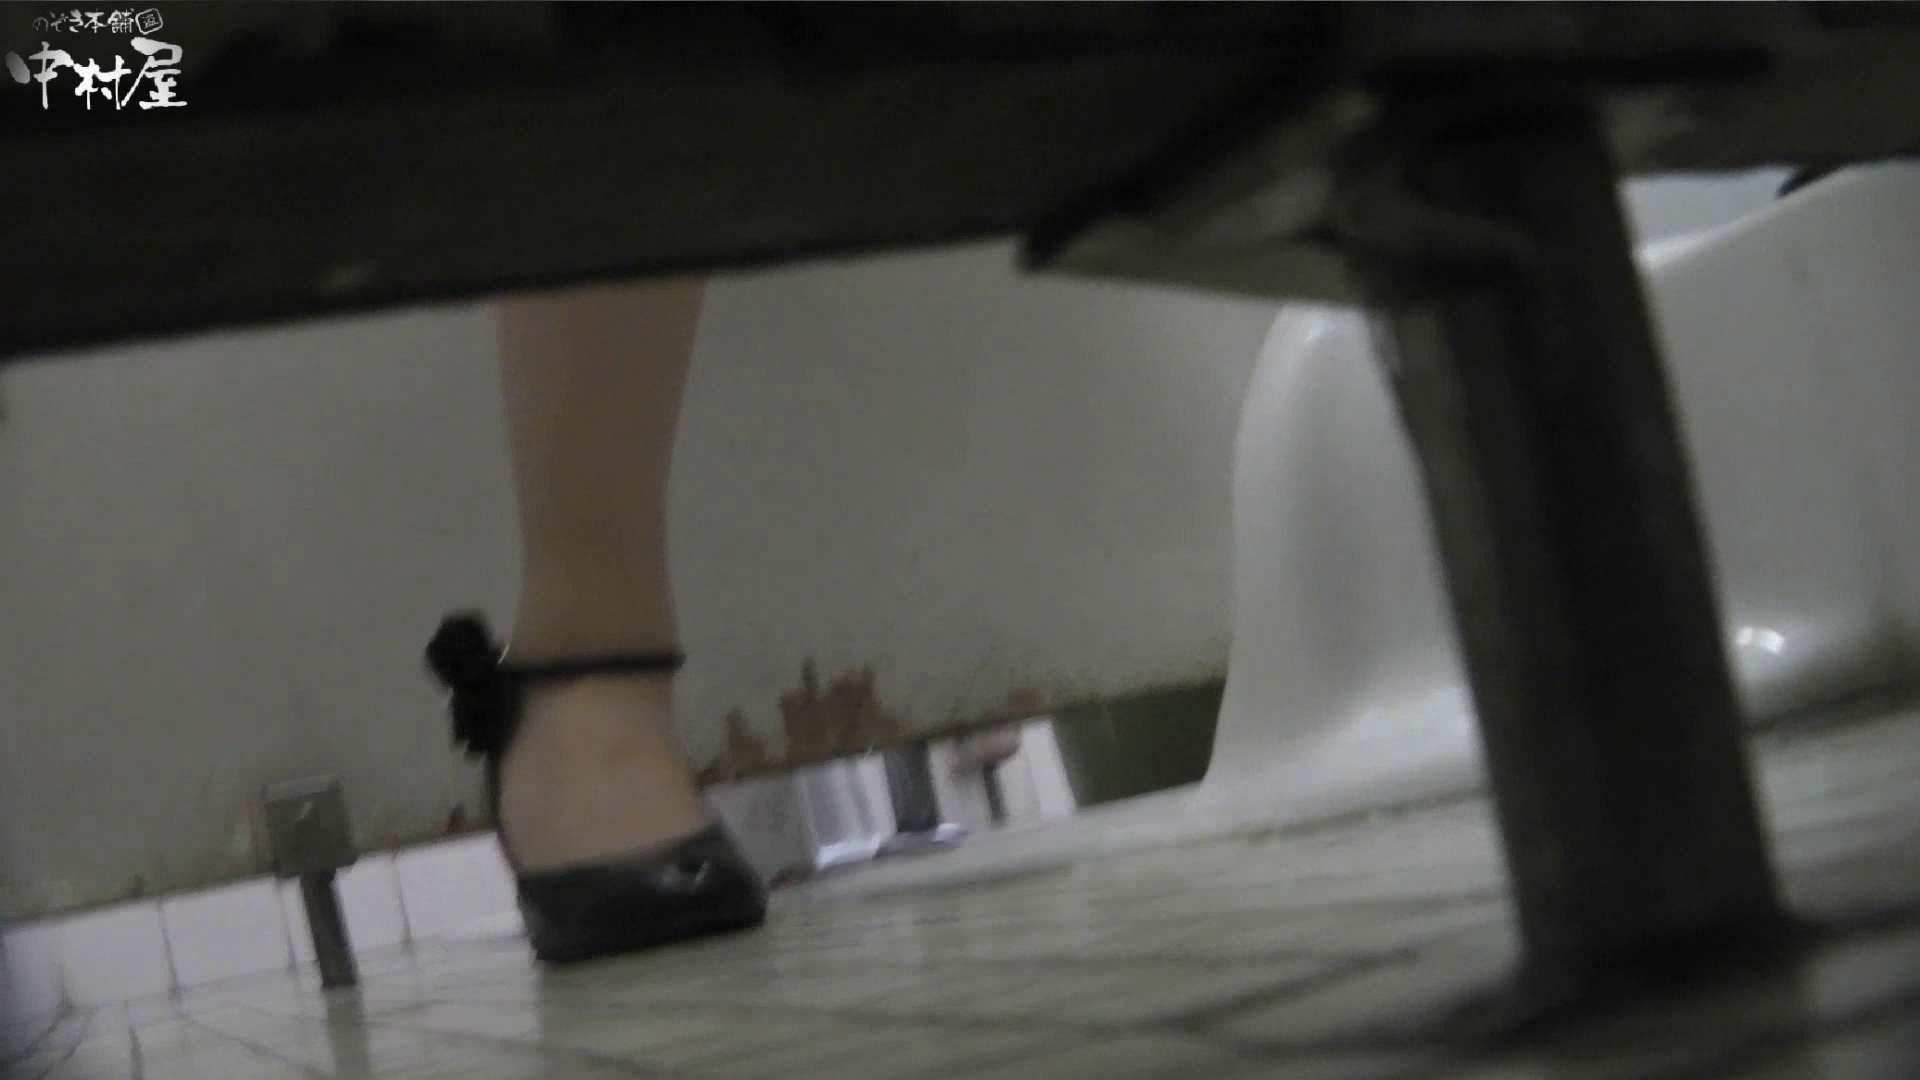 vol.08 命がけ潜伏洗面所! わかめ酒タラタラ 洗面所 ワレメ動画紹介 47連発 2